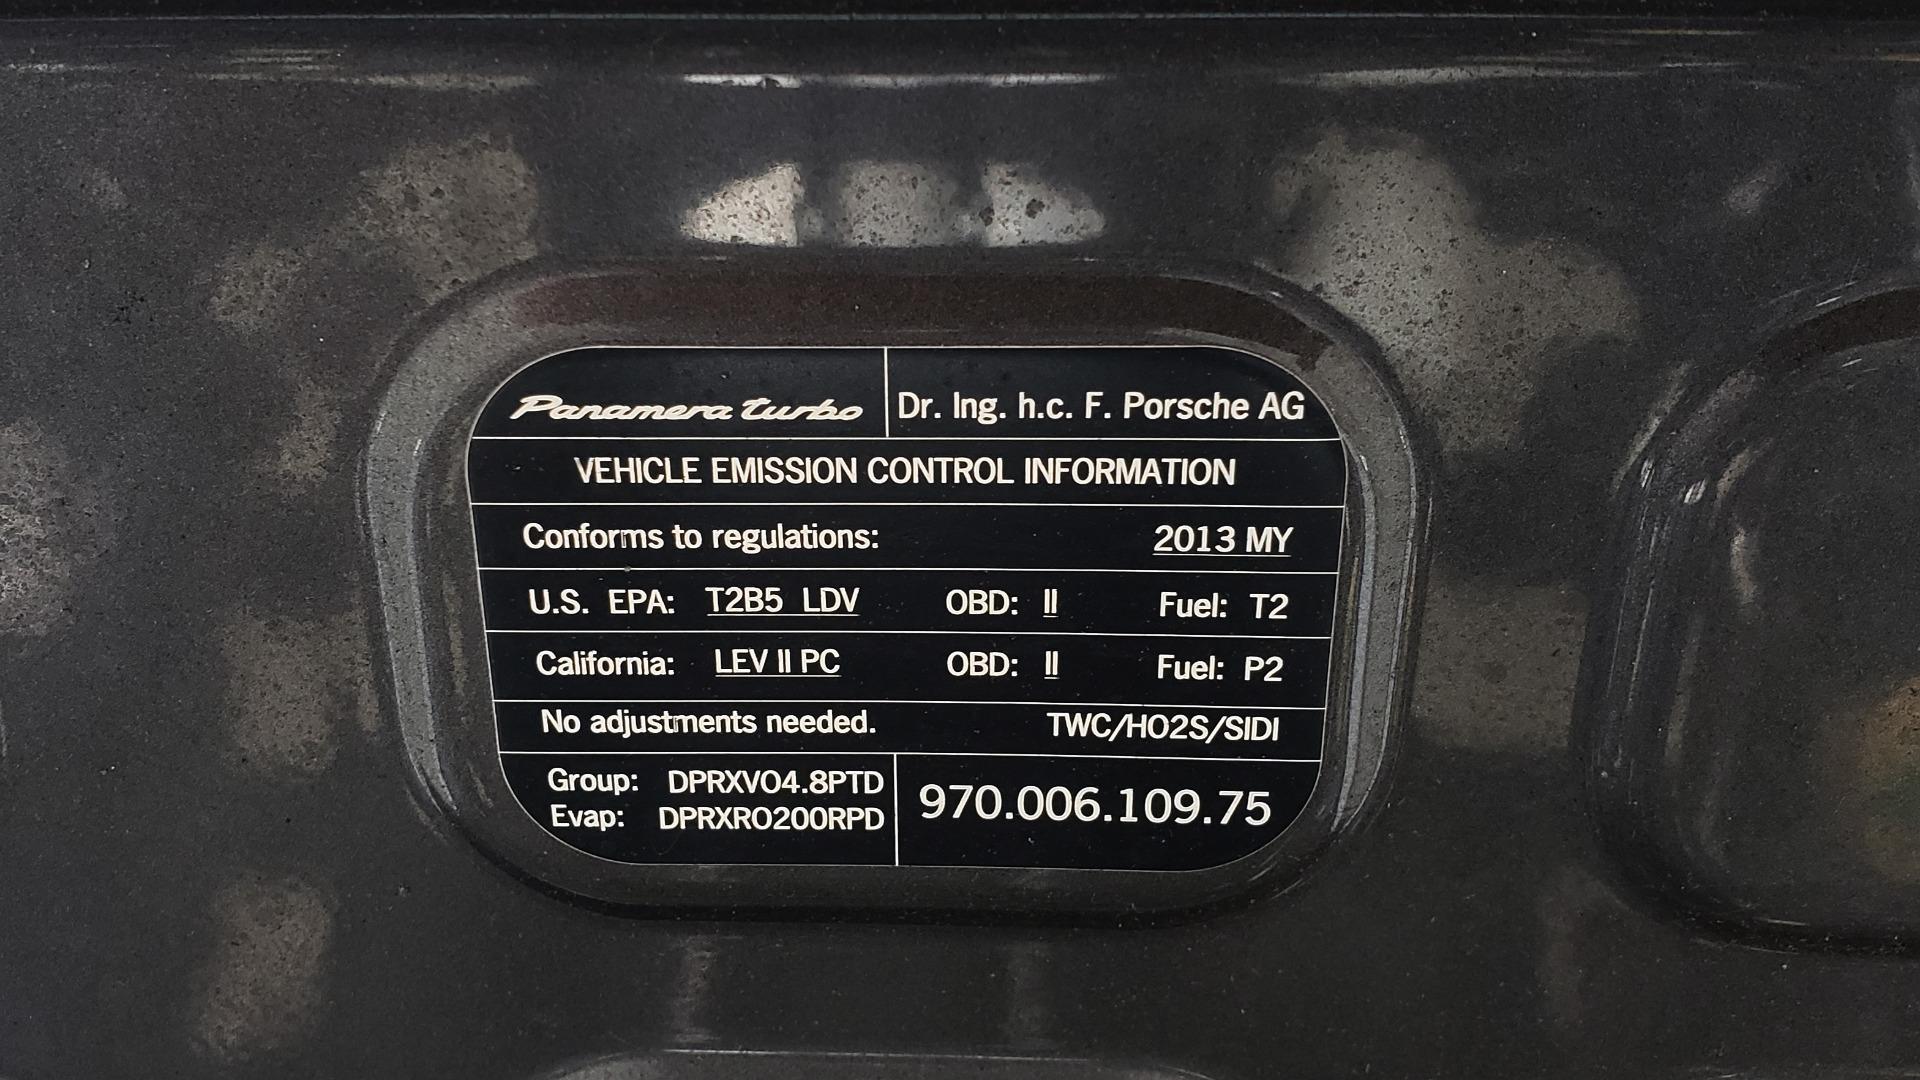 Used 2013 Porsche PANAMERA TURBO 4.8L V8 / AWD / NAV / SUNROOF / LCA / PARK ASST / BURMESTER for sale $45,995 at Formula Imports in Charlotte NC 28227 13